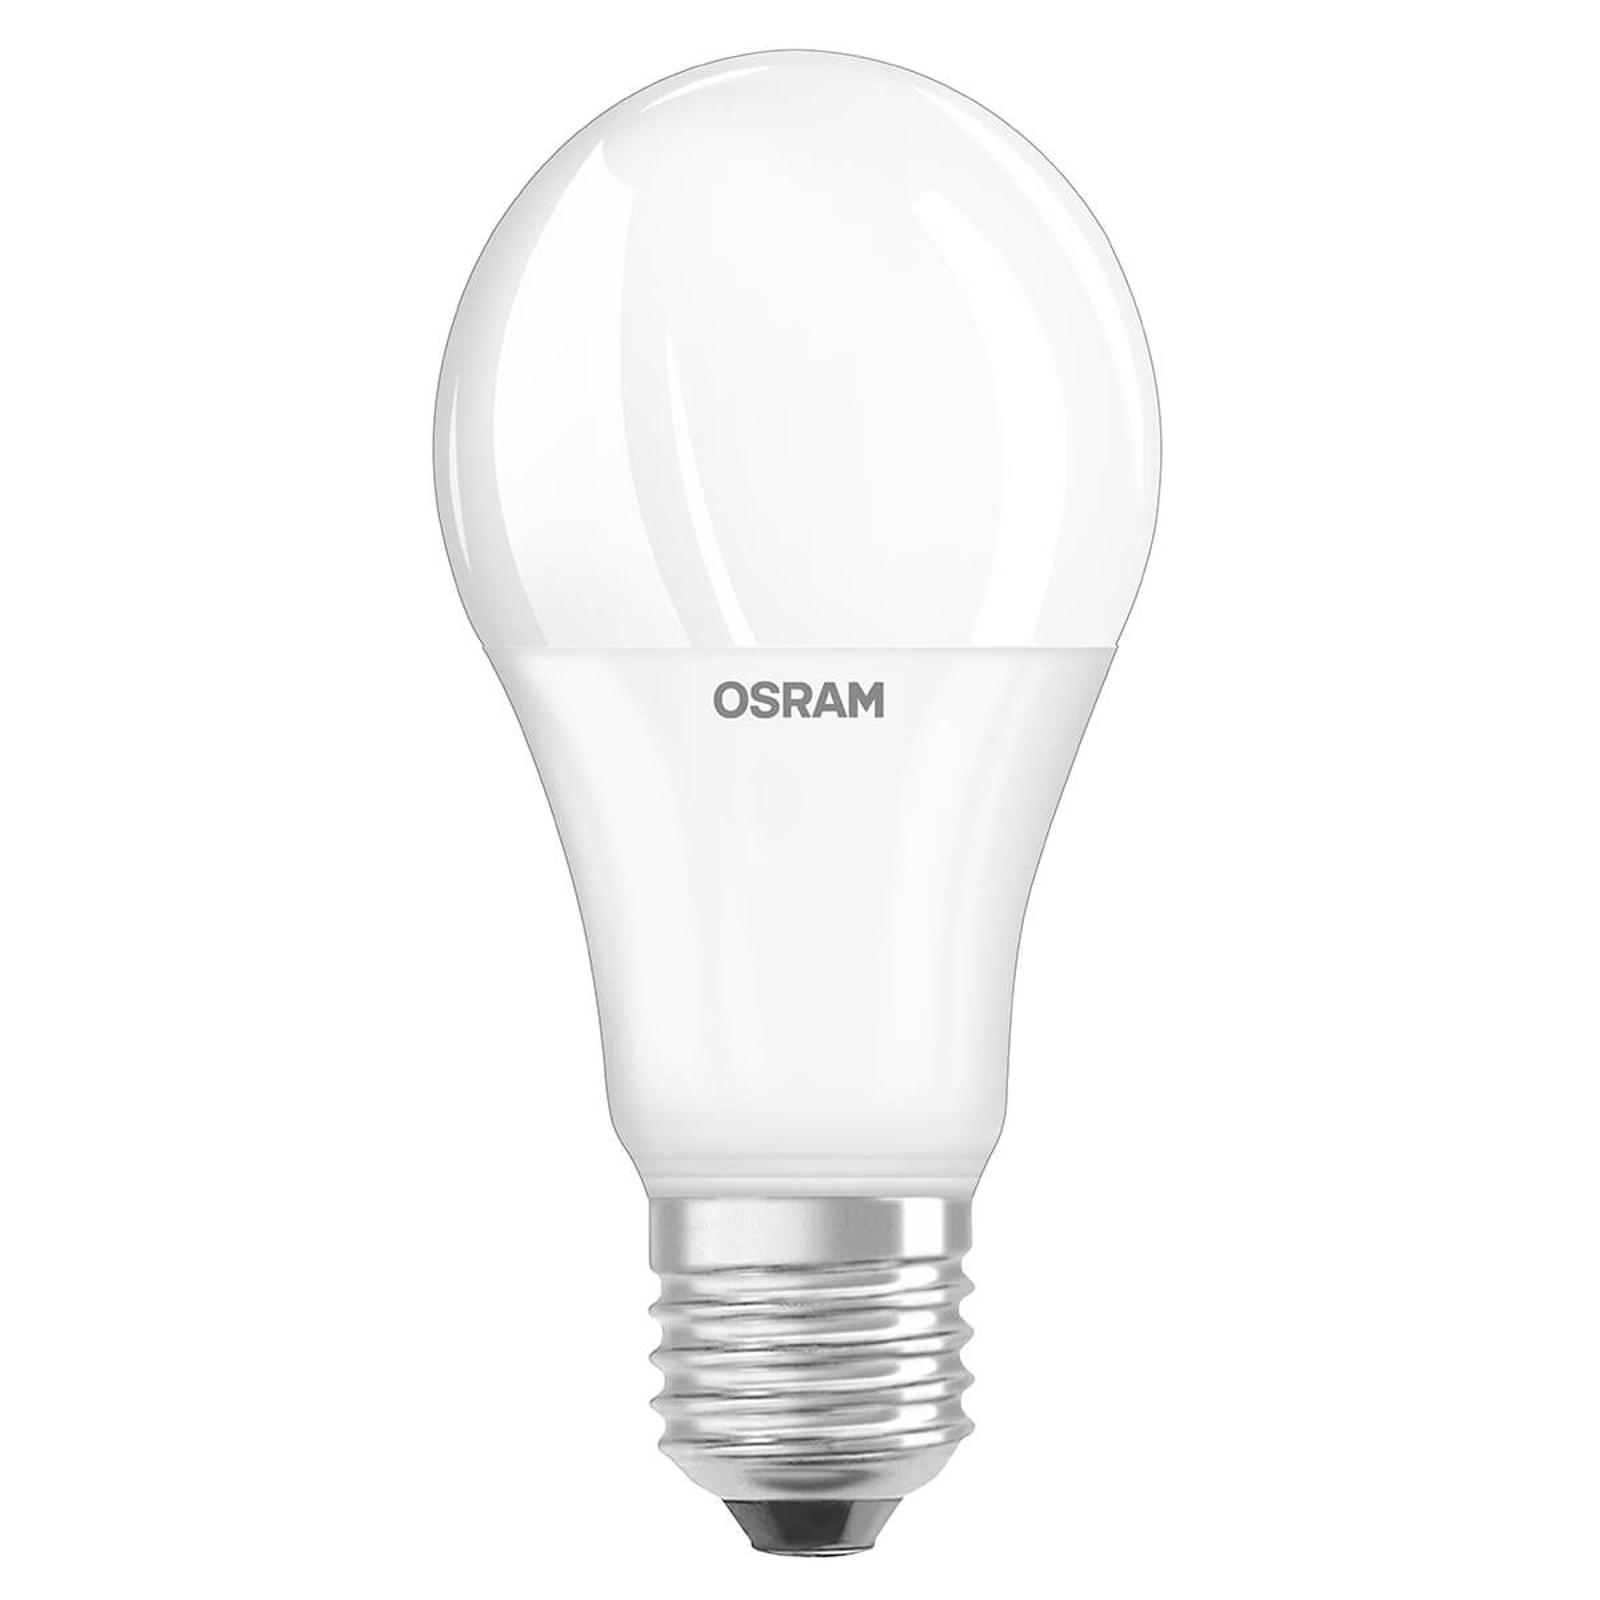 OSRAM LED-Lampe E27 6W opal Tageslichtsensor